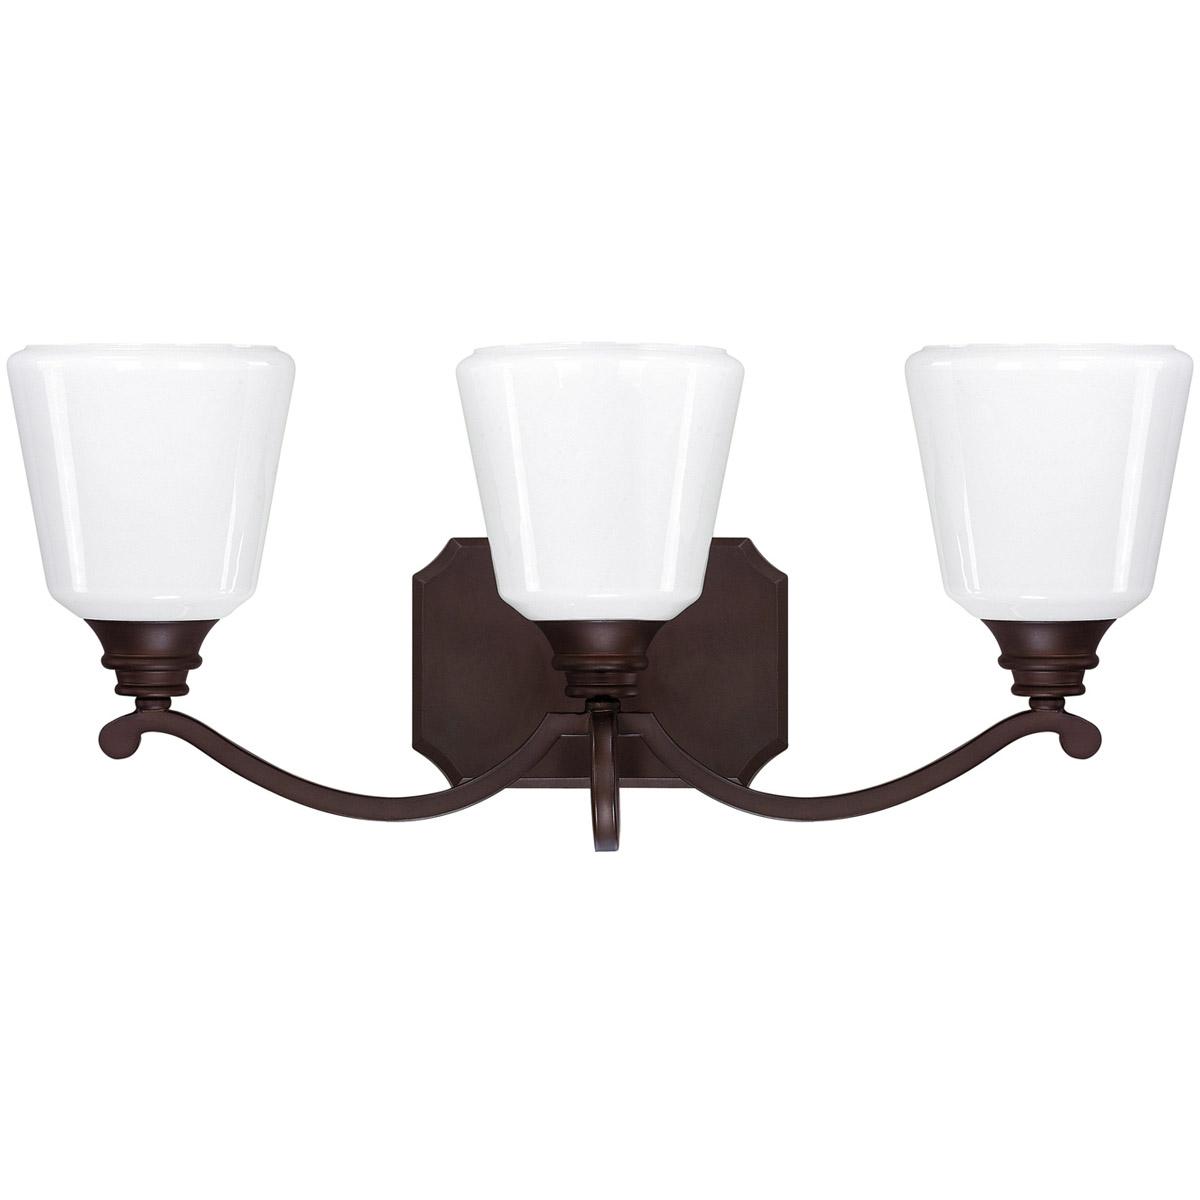 Capital lighting fixtures 8113bb 300 leigh bathroom vanity light